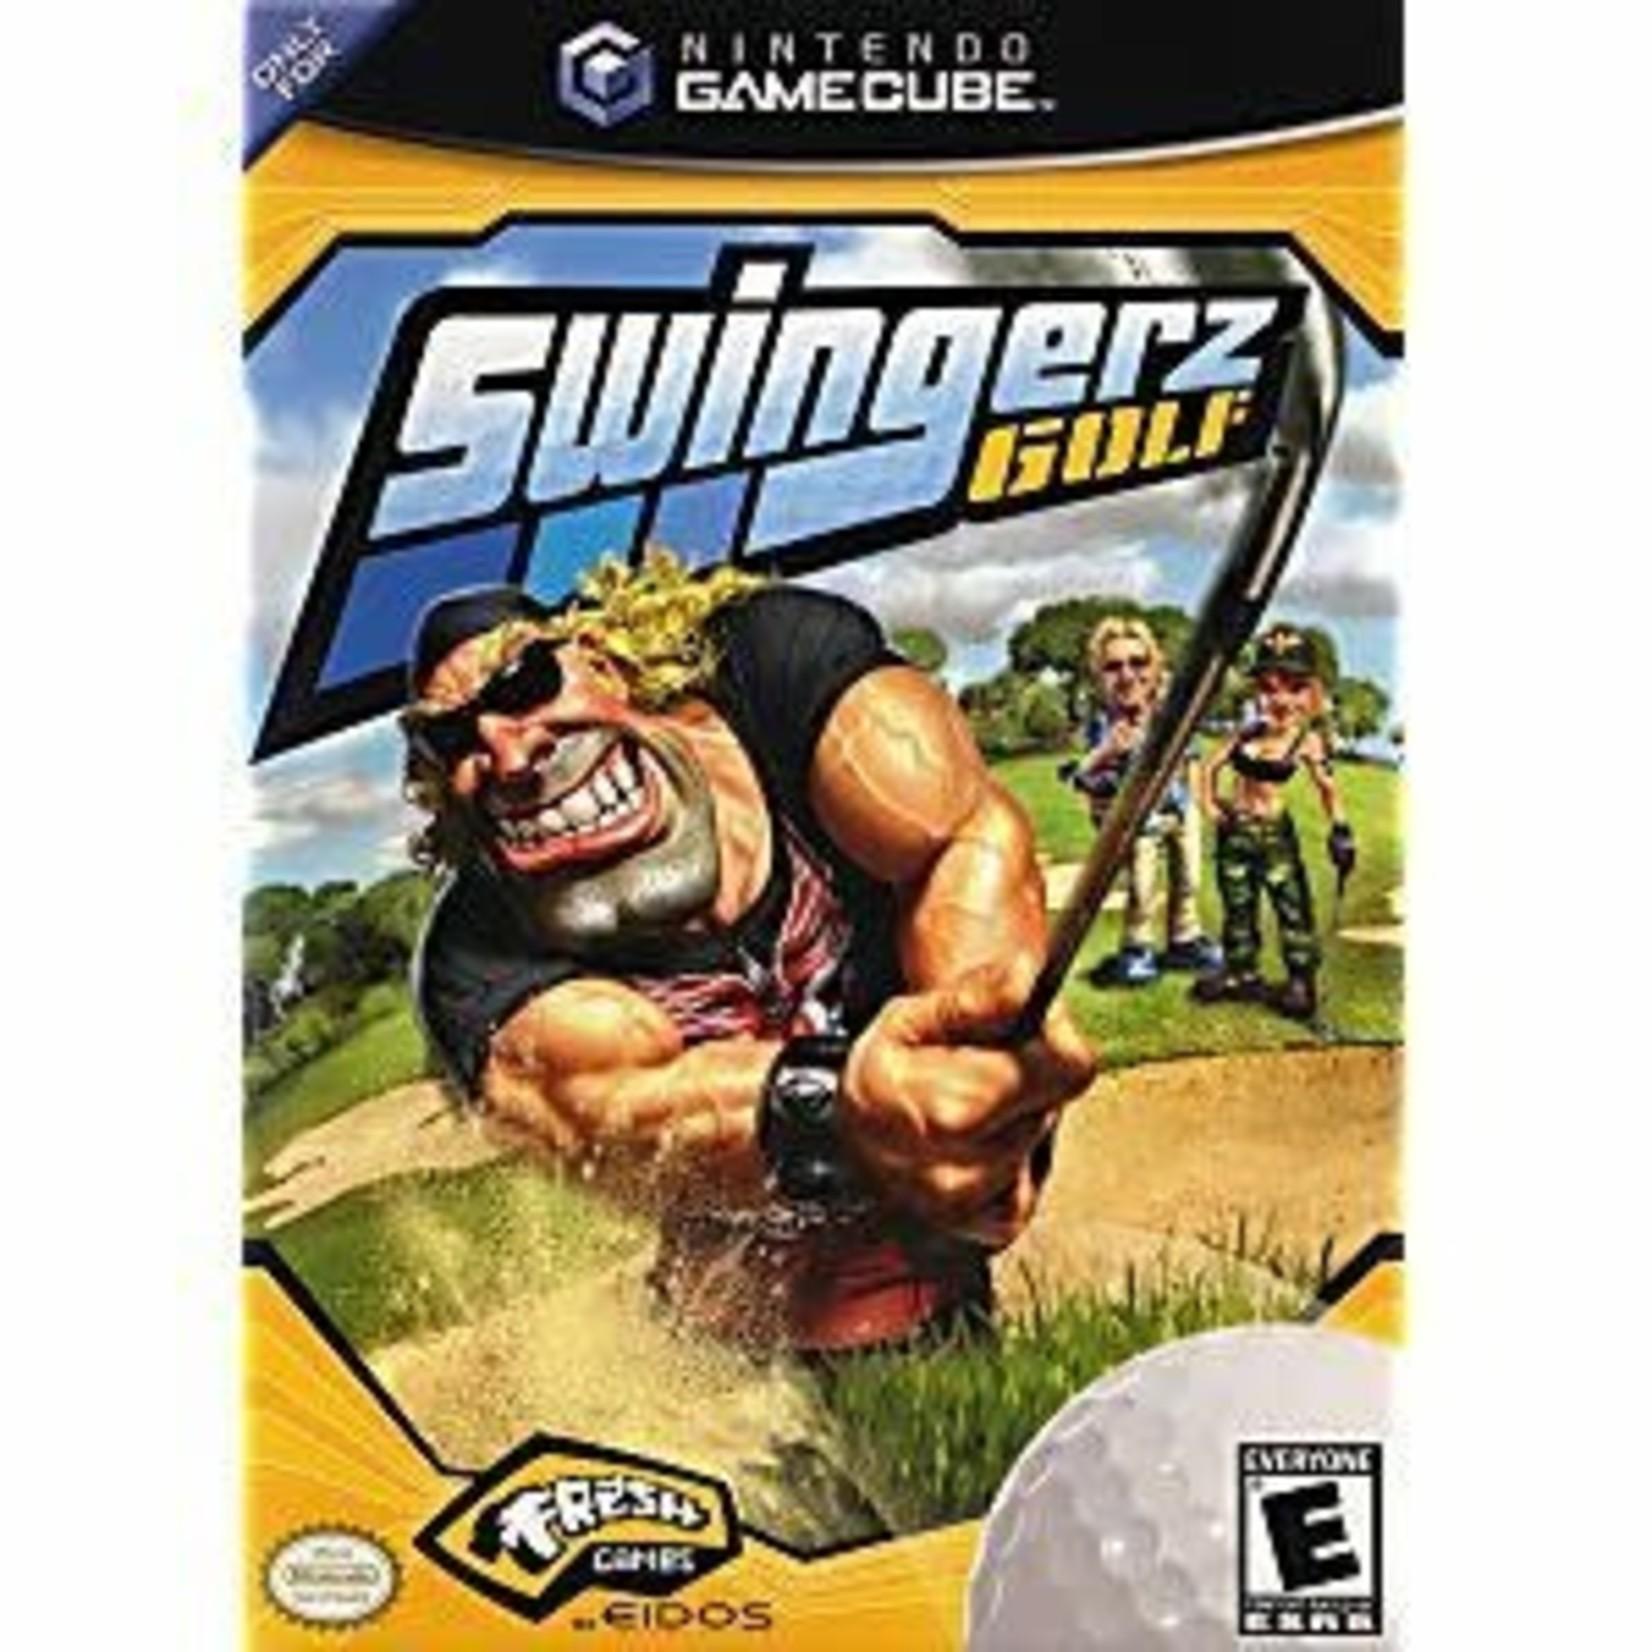 GCU-Swingerz Golf